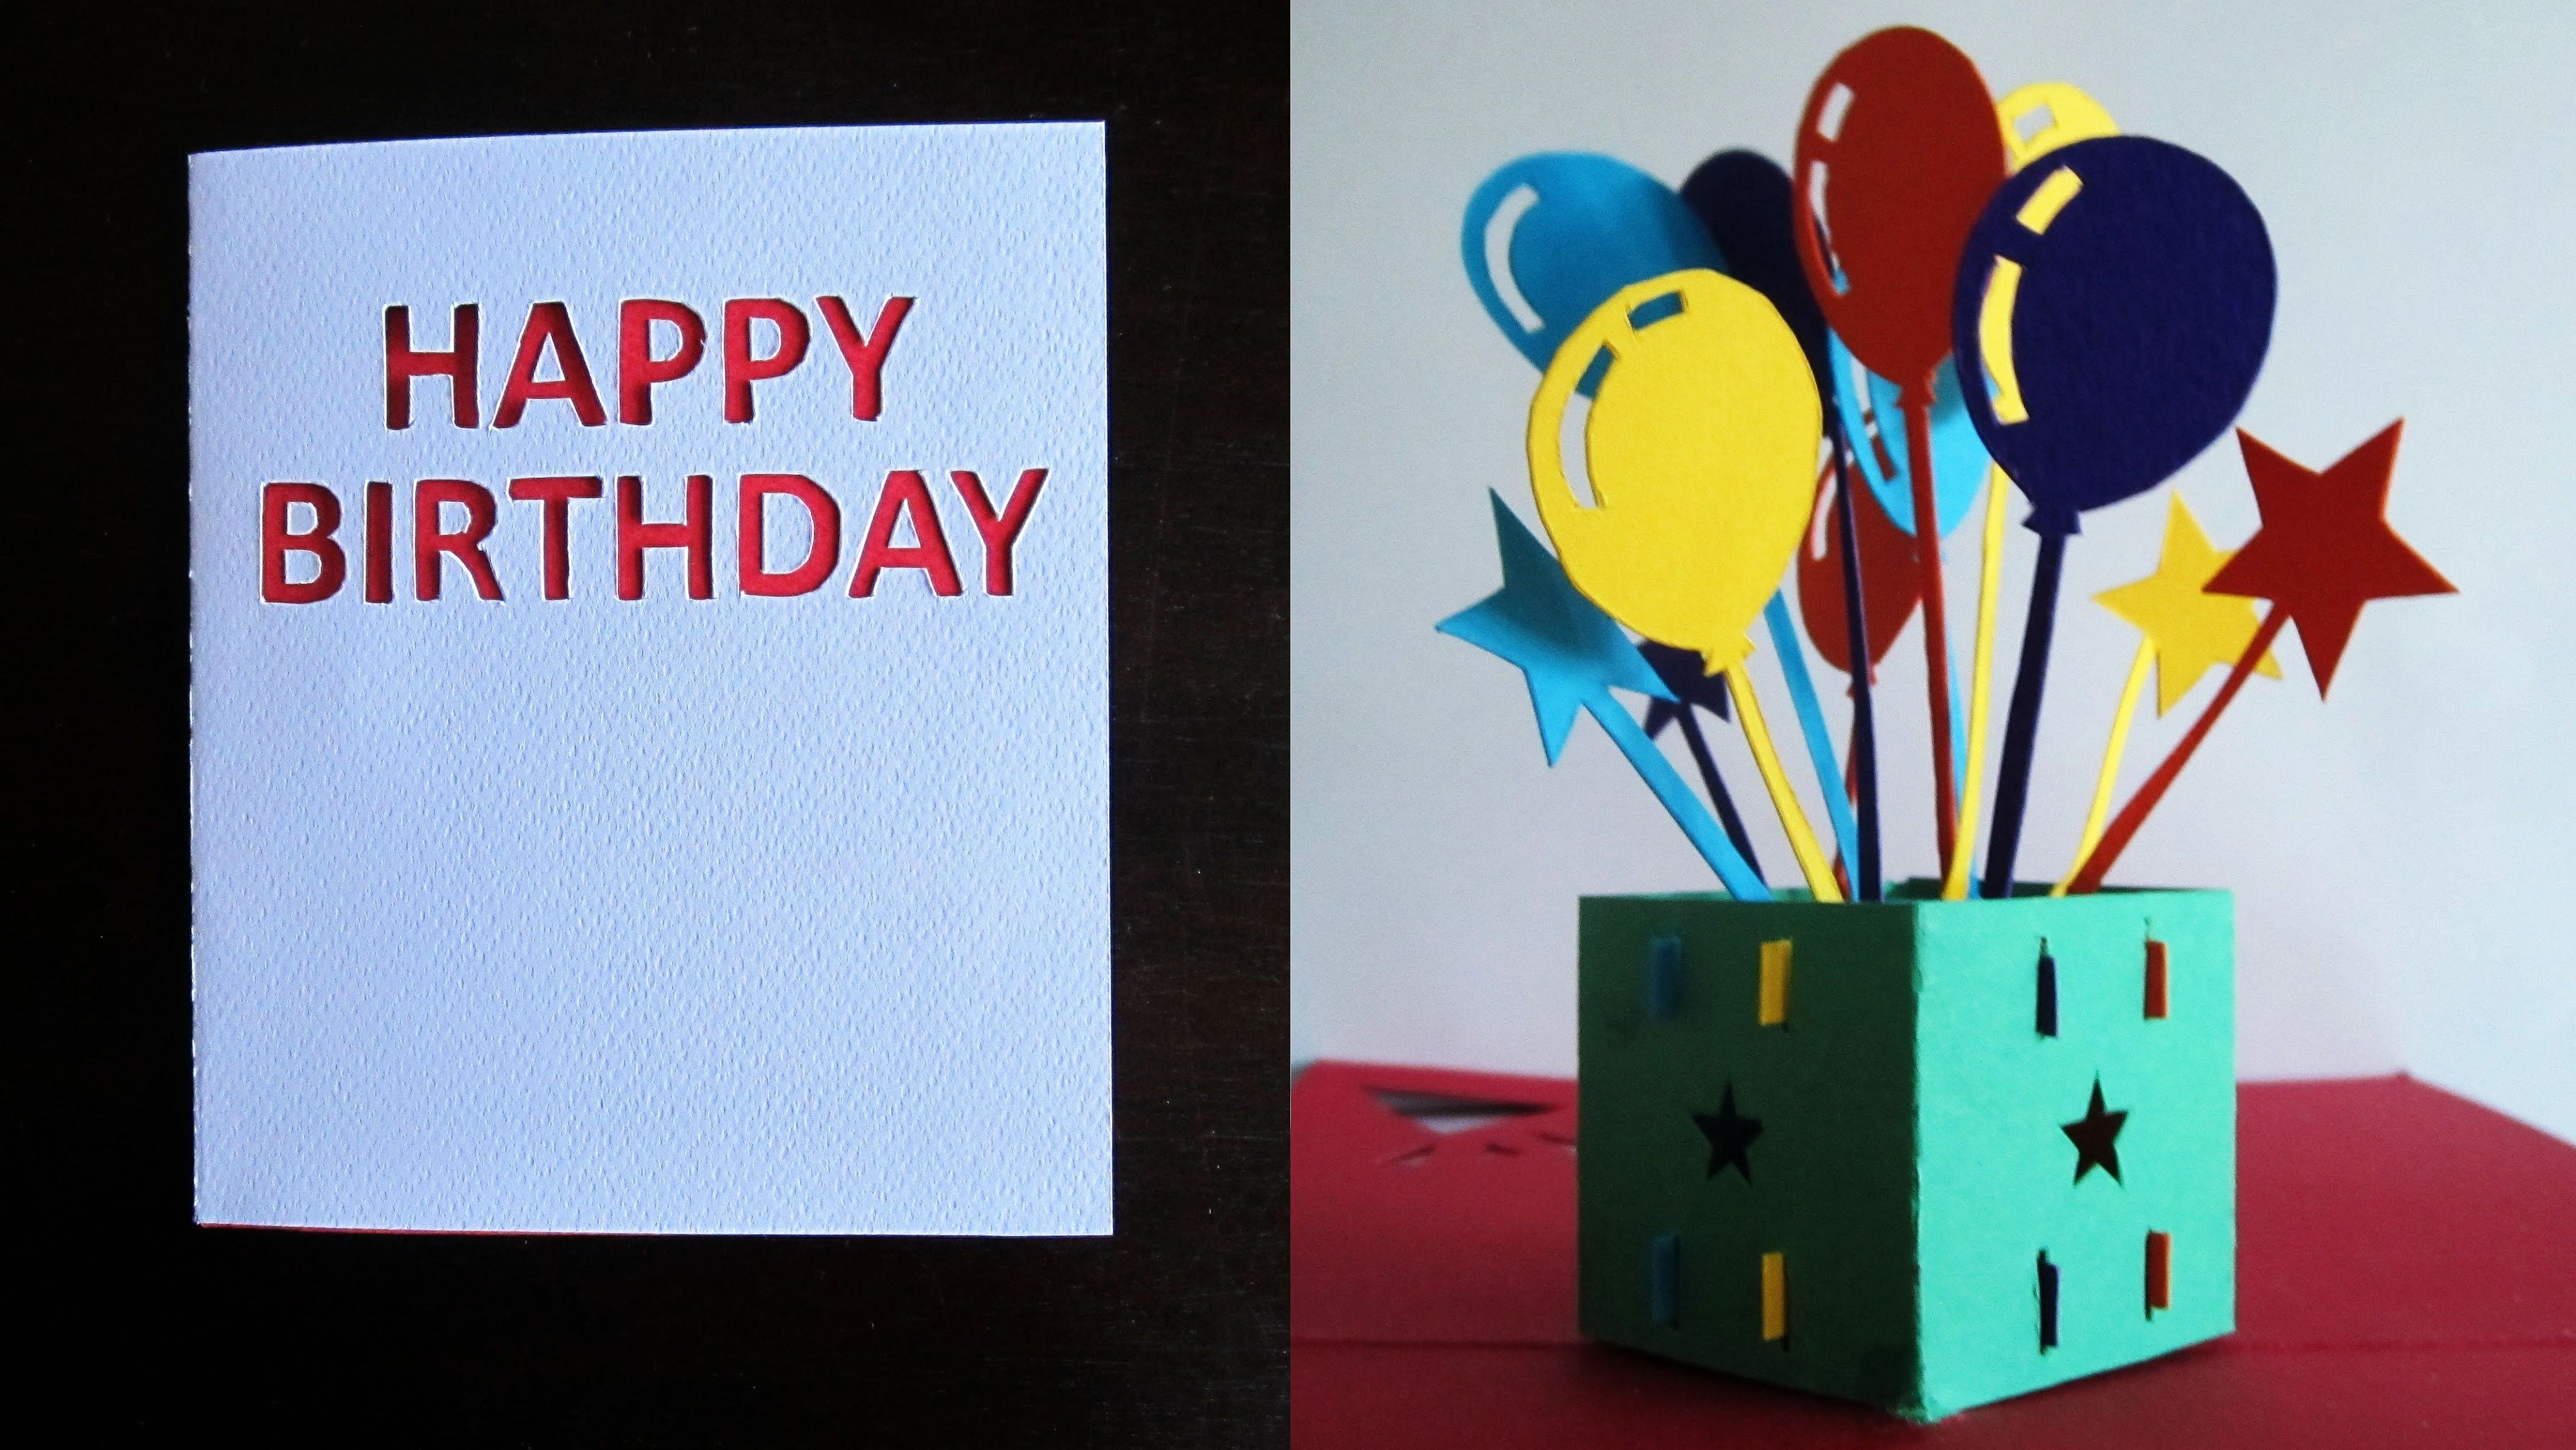 Birthday Pop Up Card Balloon Star Popup Box Ezycraft Pop Up Card Templates Flower Birthday Cards Diy Gift Card